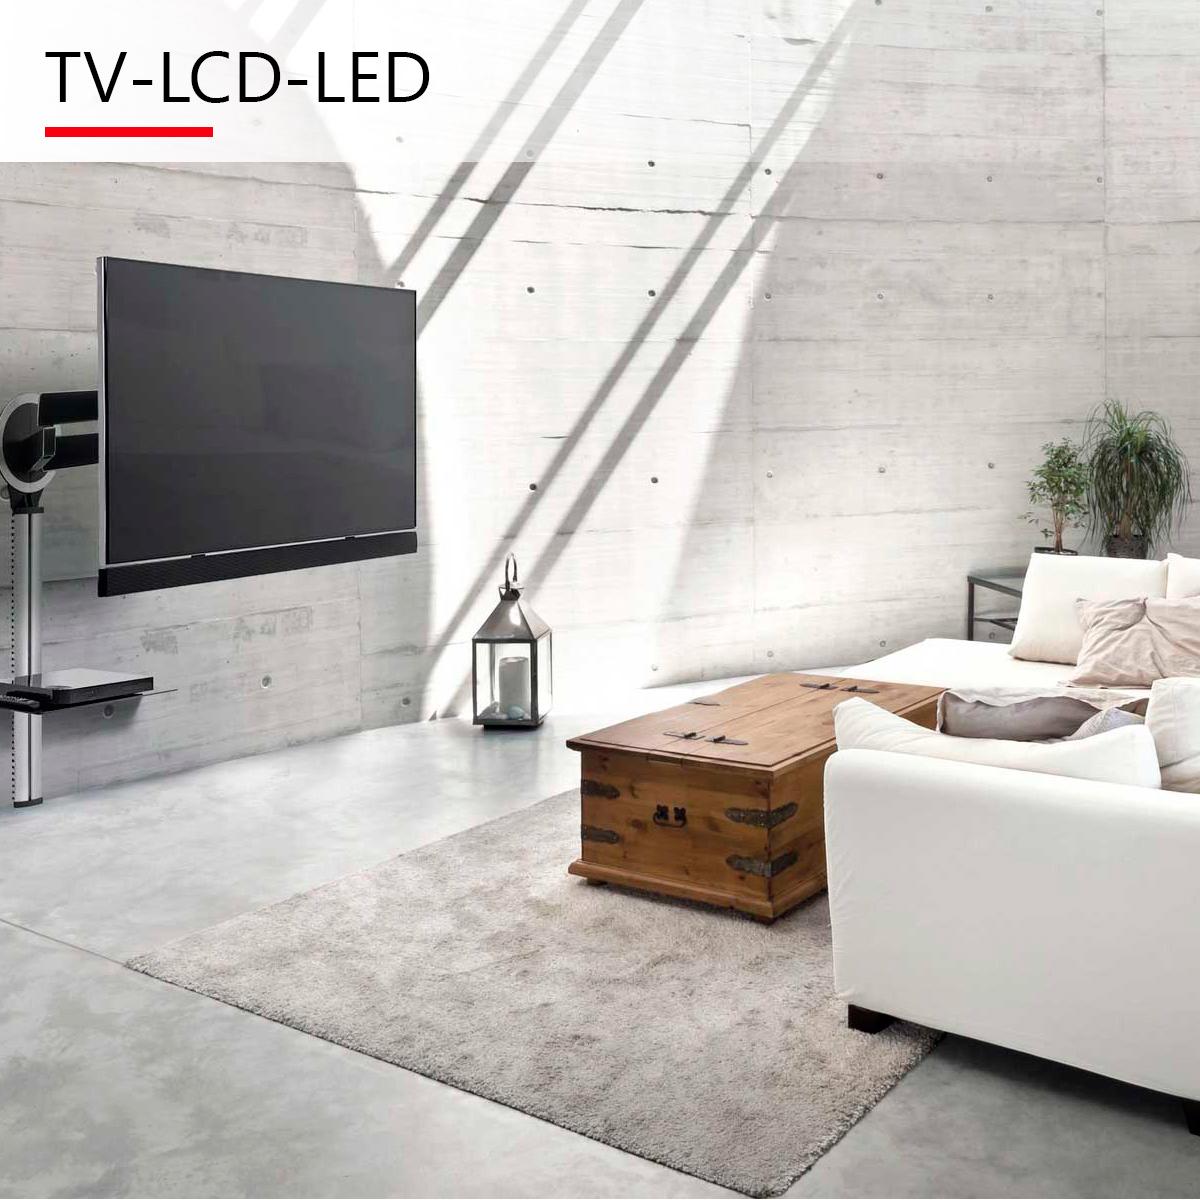 TV-LCD-LED